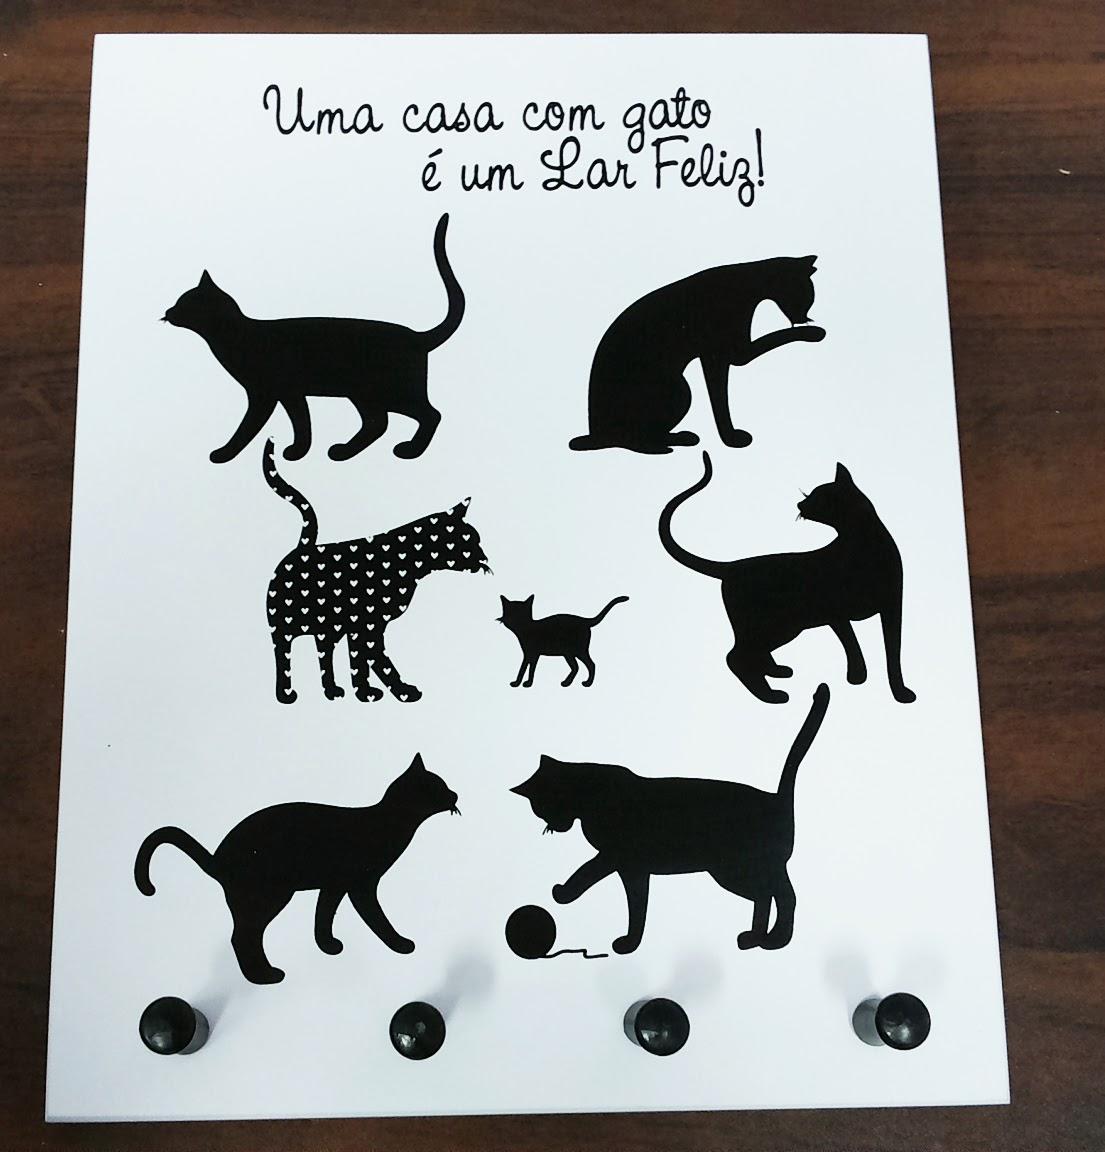 Artesanato Zenir Disarz ~ CR MIX Decoraç u00e3o e Presentes Porta Chave Gato e Porta Chave Cachorro Zenir Disarz